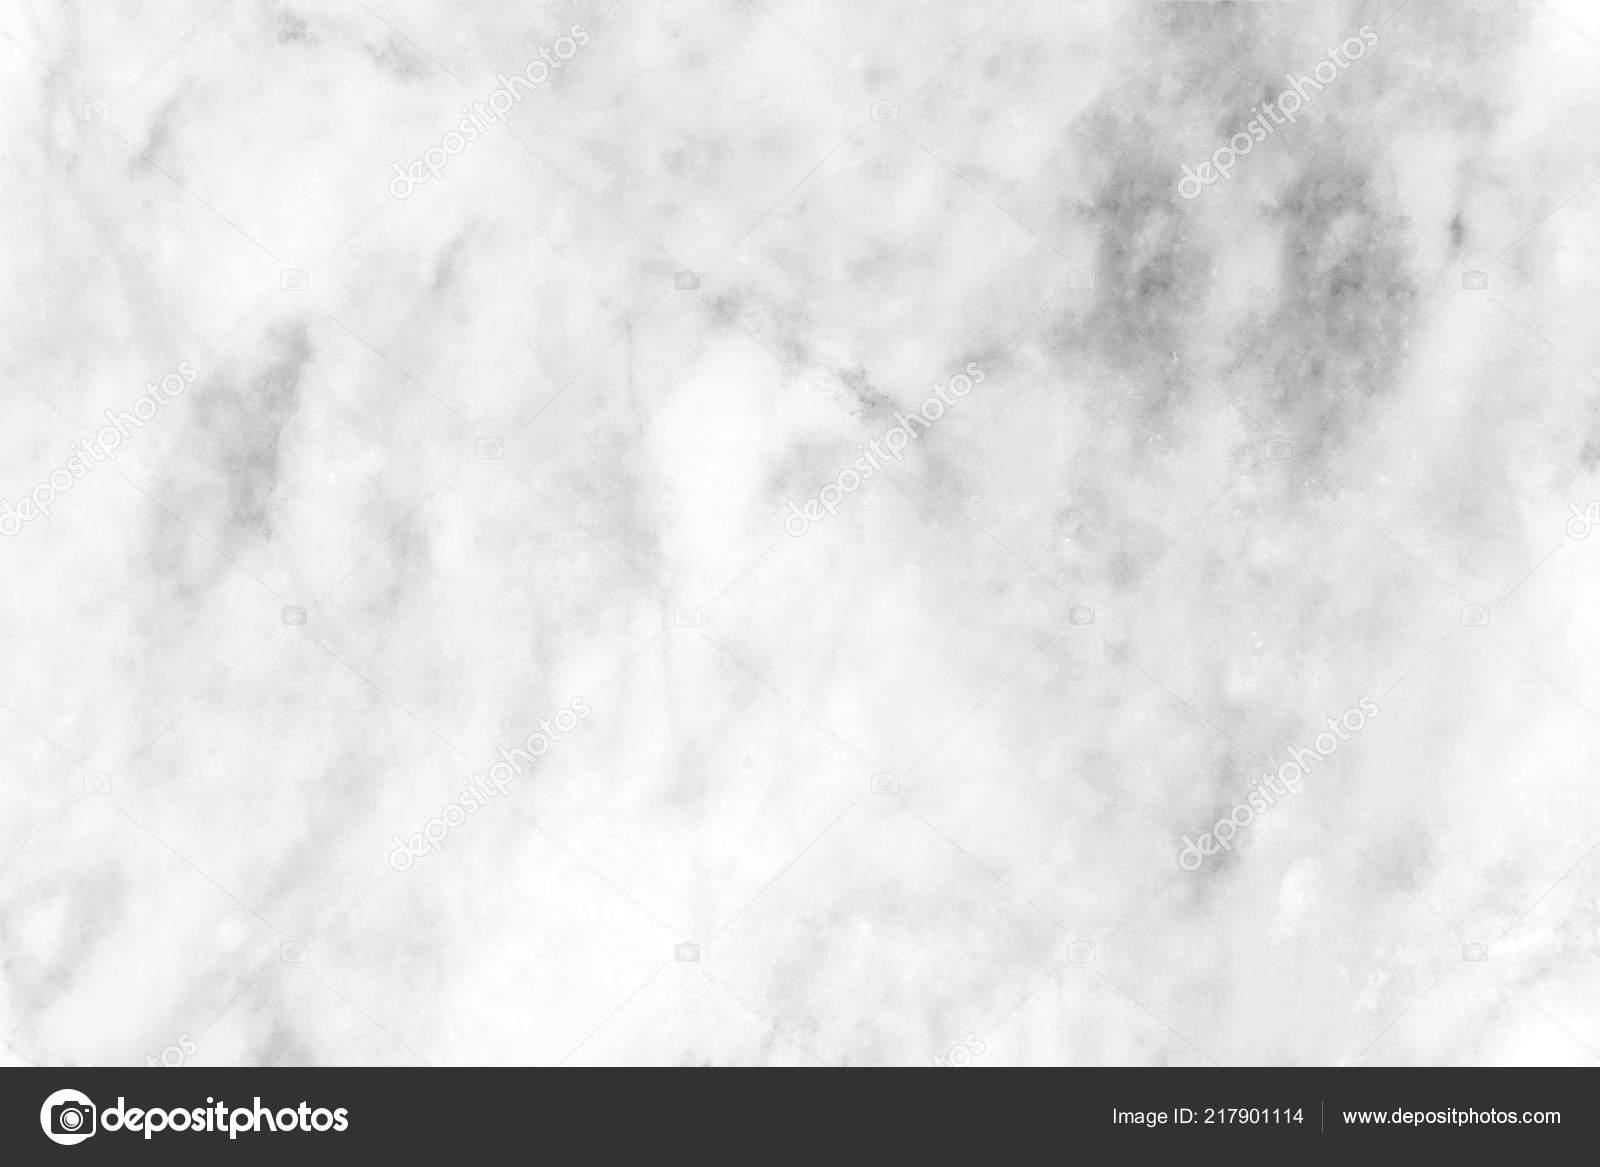 Grey Marble Stone Background Grey Marble Texture Wall Pattern Interior Stock Photo C Nokfreelance 217901114